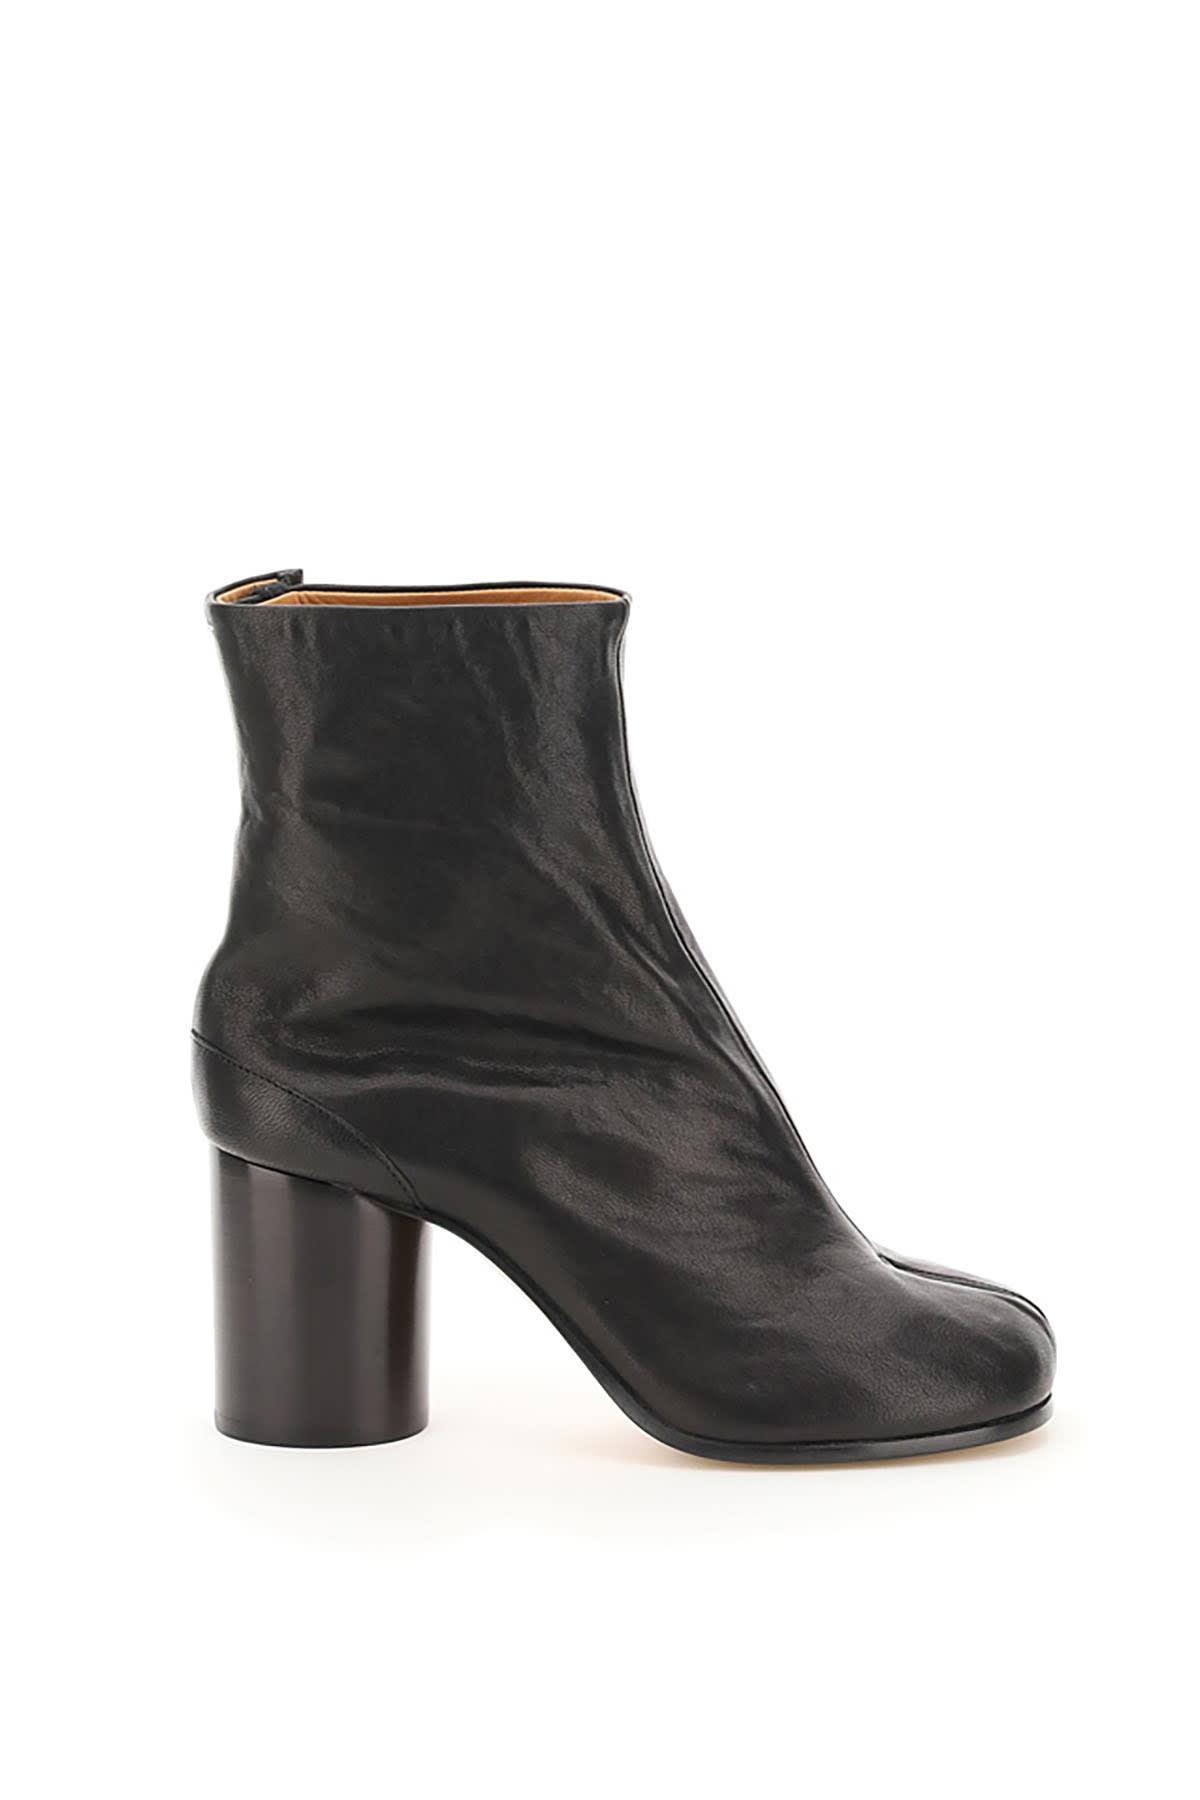 Buy Maison Margiela Tabi Leather Boots online, shop Maison Margiela shoes with free shipping